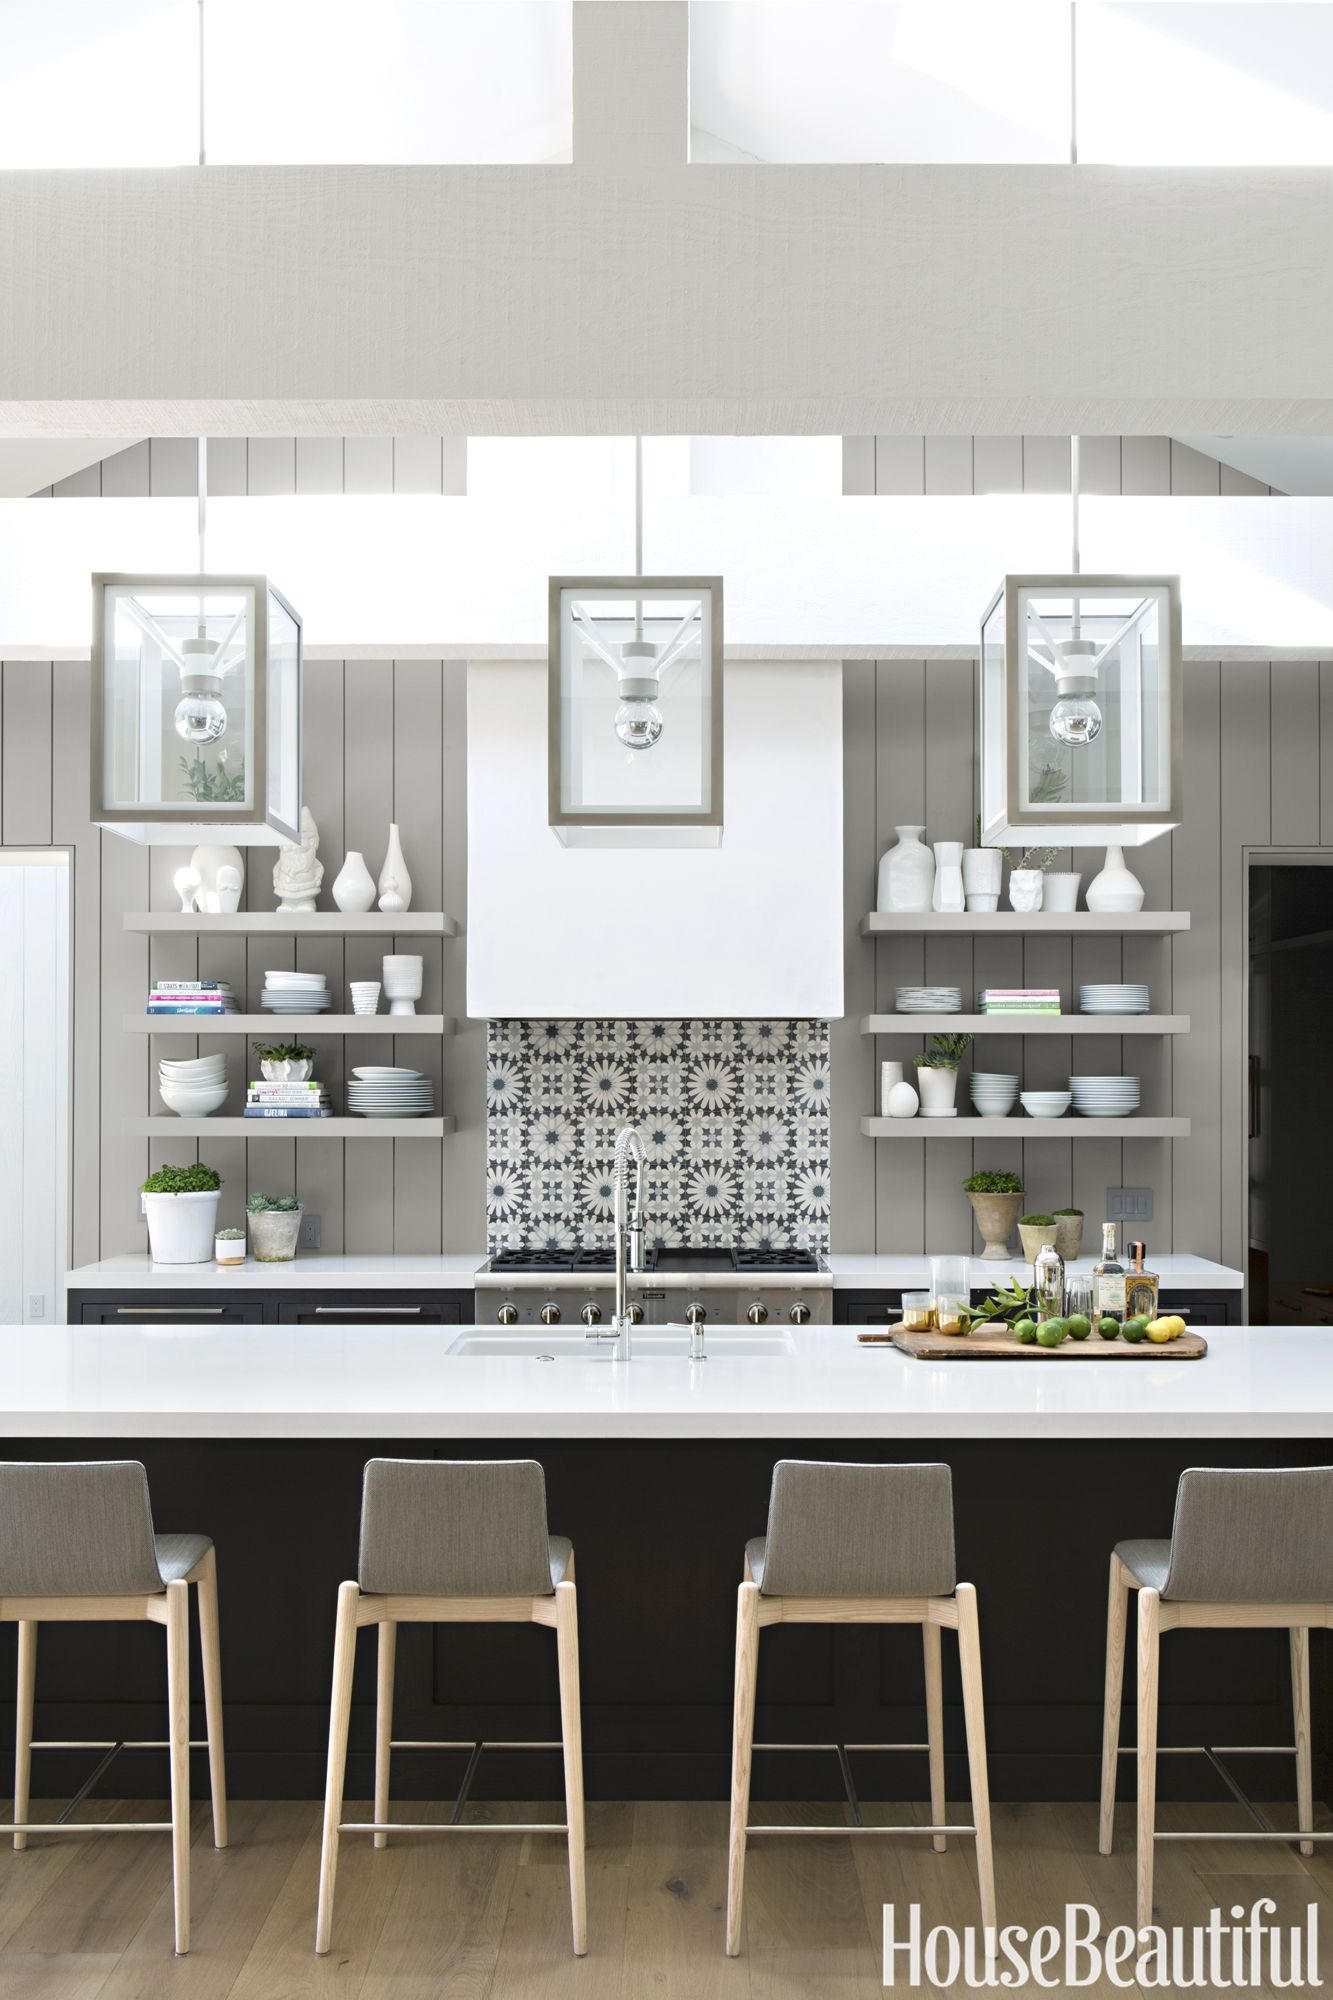 image & Kitchen Cabinet Design Ideas - Unique Kitchen Cabinets